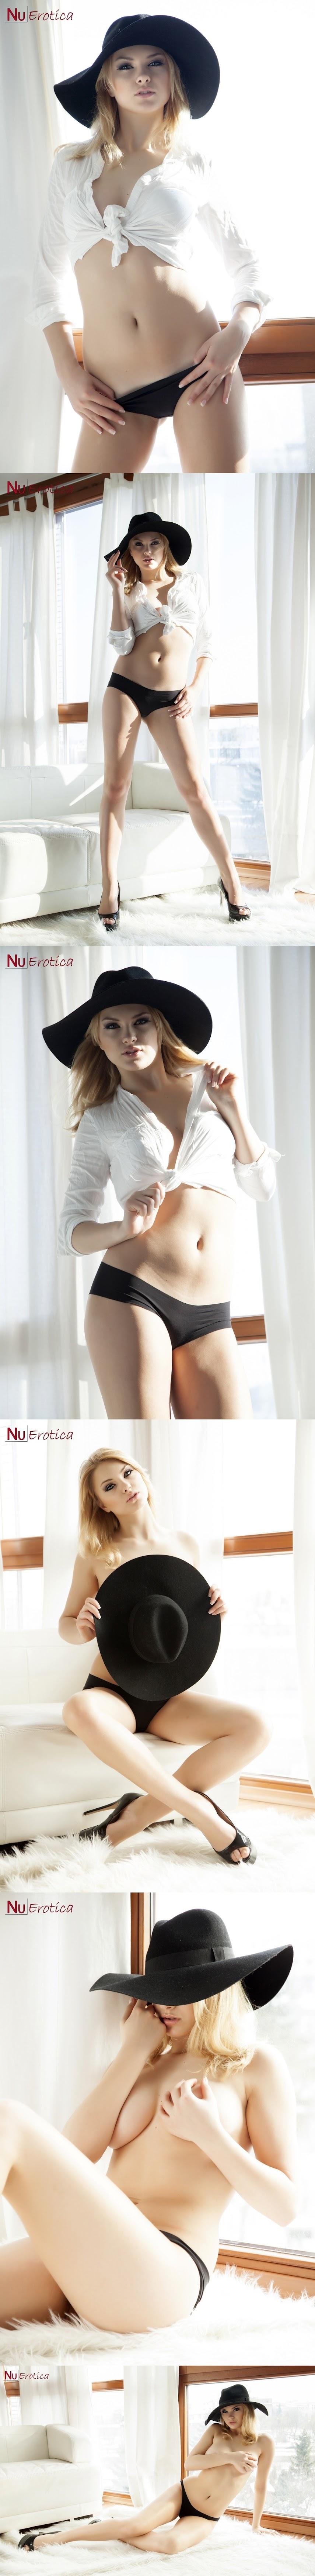 NuErotica 2015-08-24 Carla Sonre - Carla Sonre So Sexy In A Hat - Girlsdelta